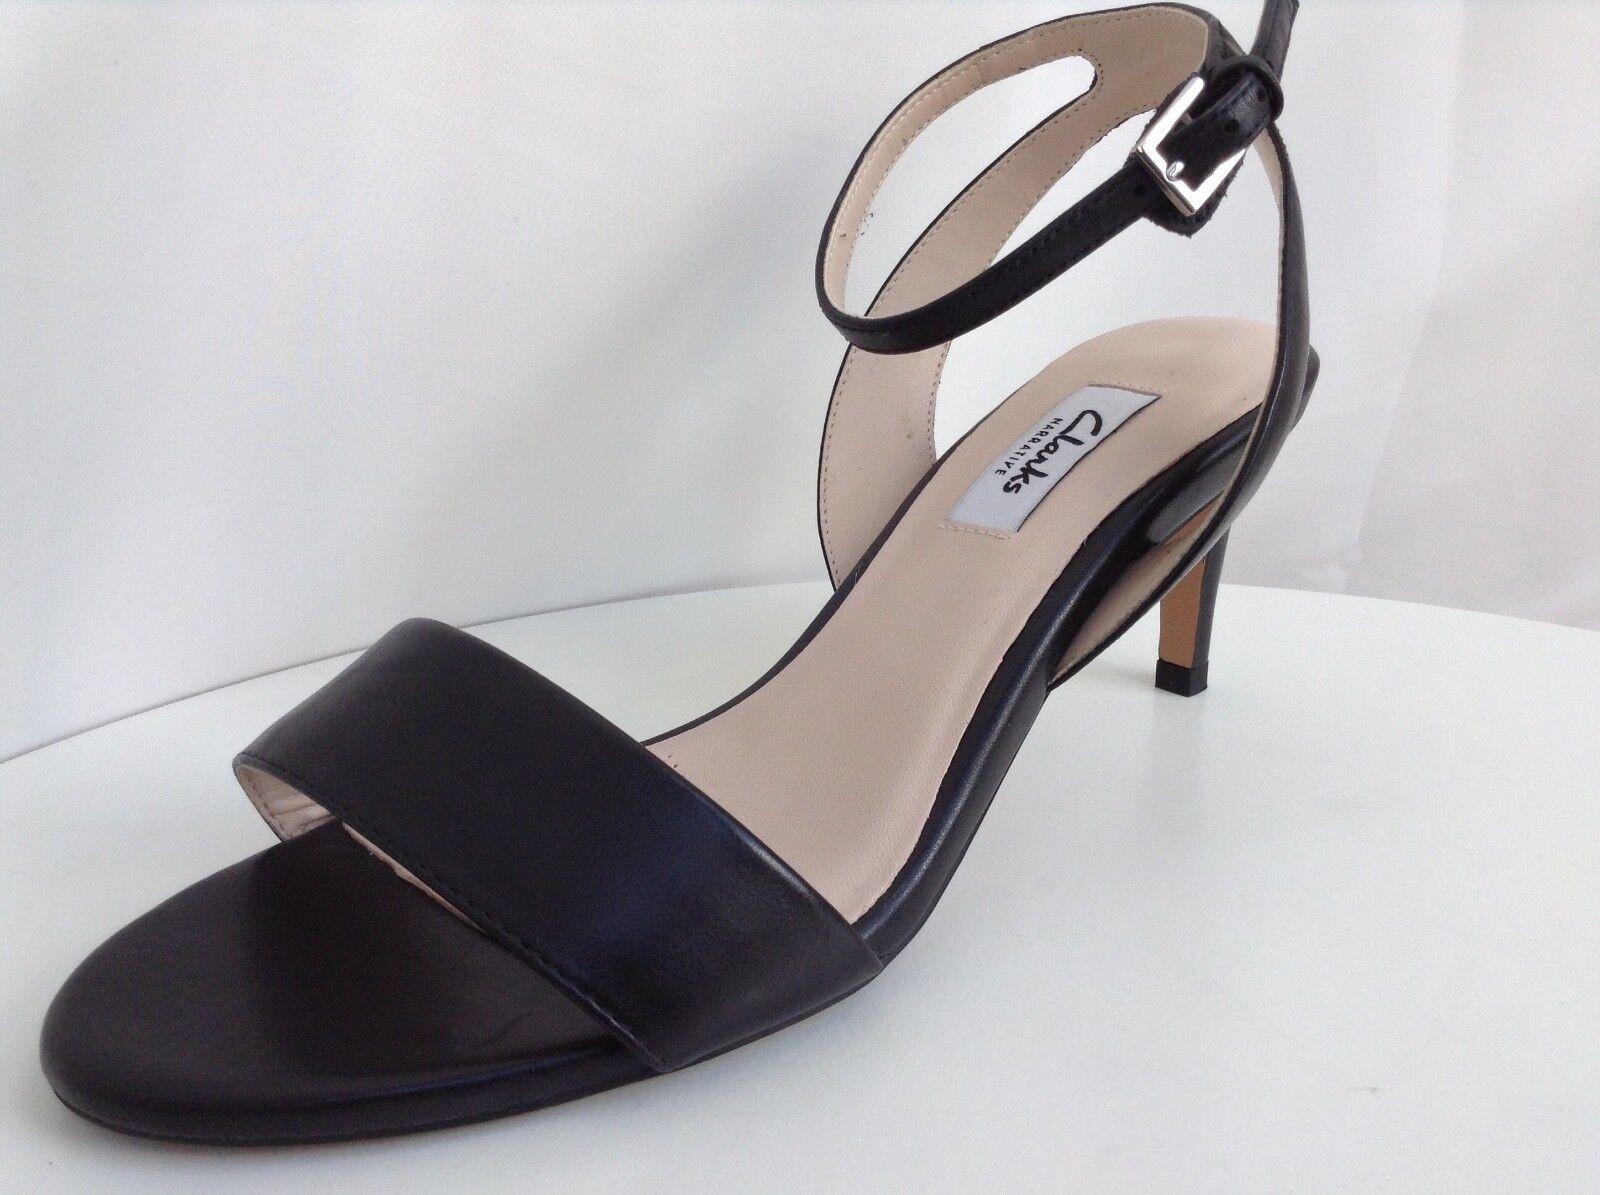 Clarks Womens Amali Jewel Black Leather Sandals size UK 4.5D